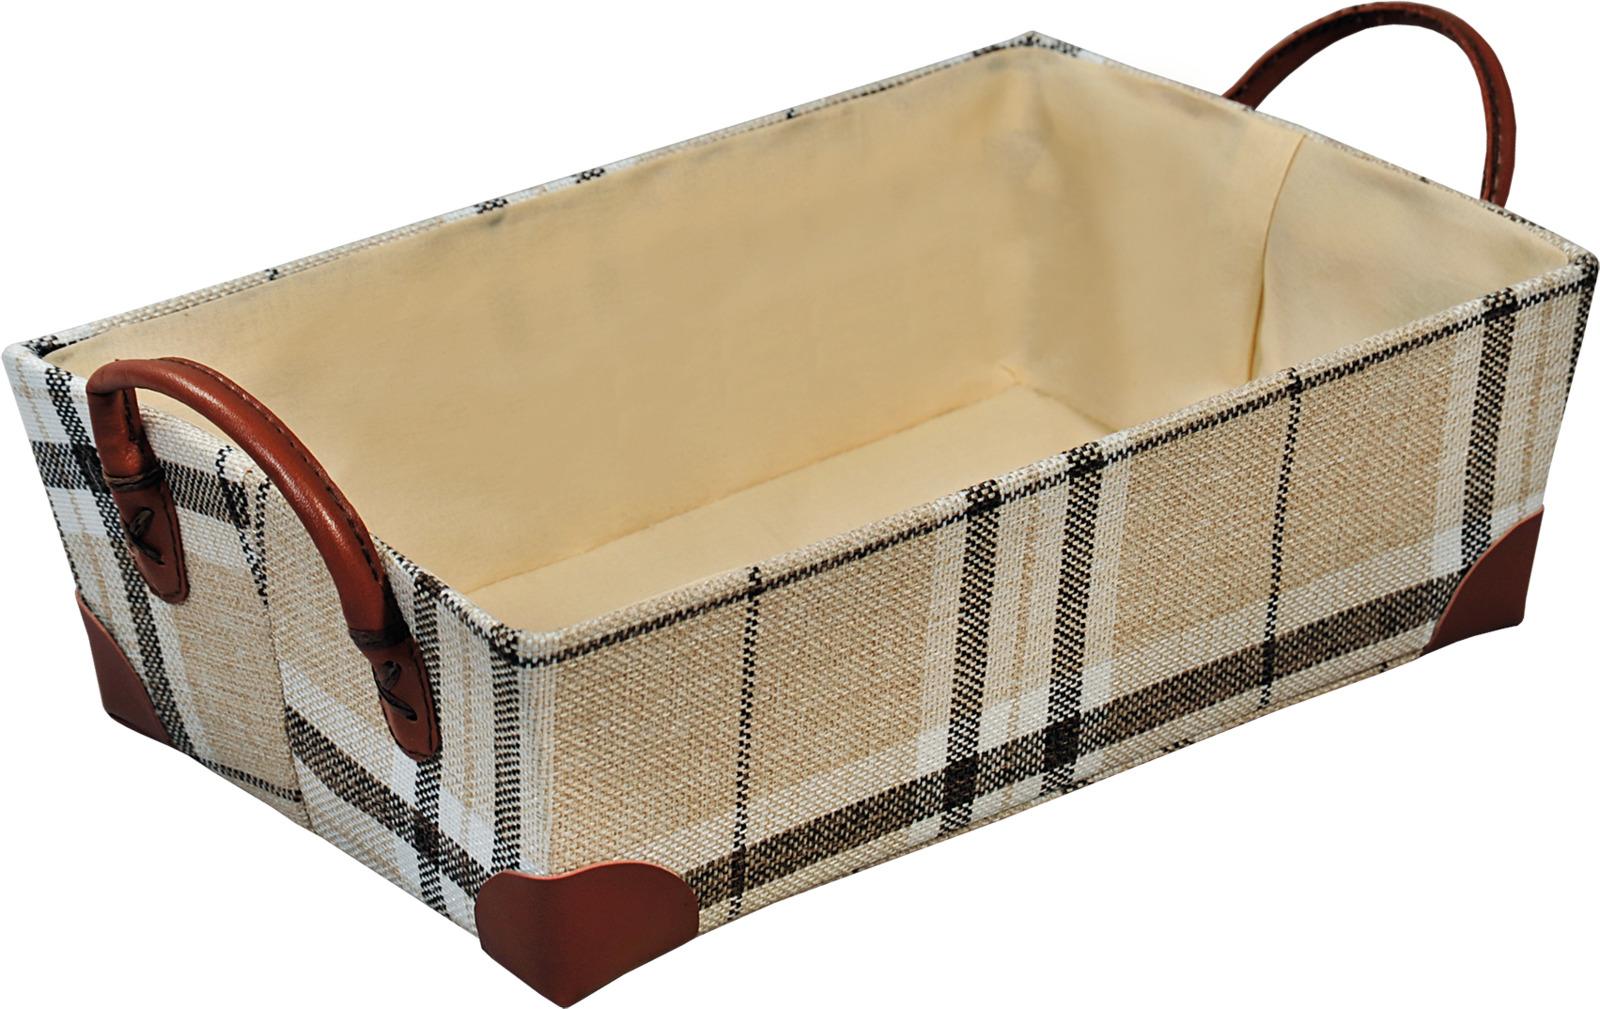 Универсальная емкость Kesper, 1931-8, бежевый, 32 х 22 х 14,5 см